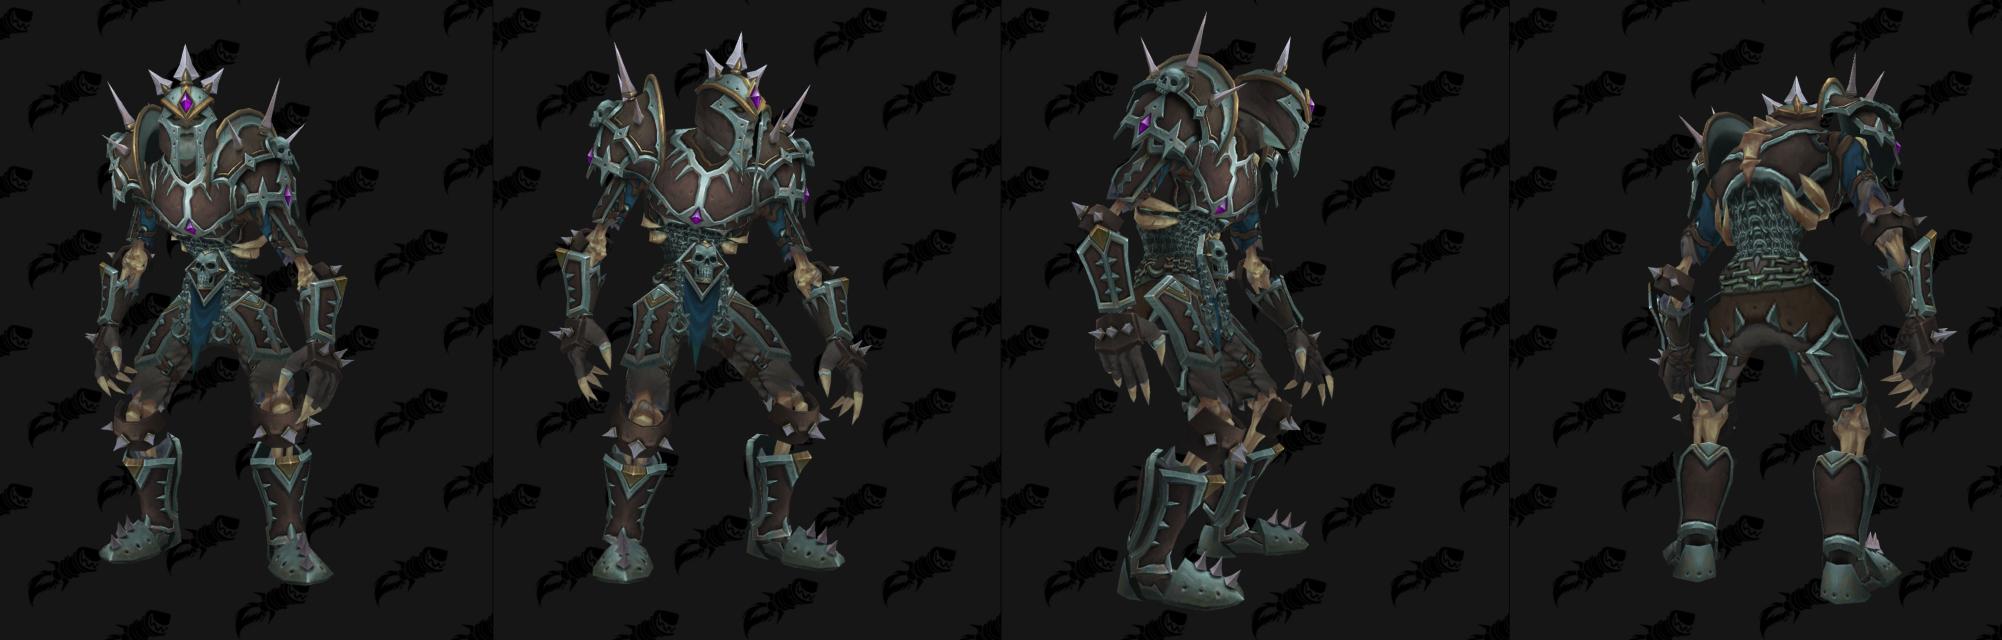 Armure Plaques Horde - Front de guerre Sombrivage Tier 3